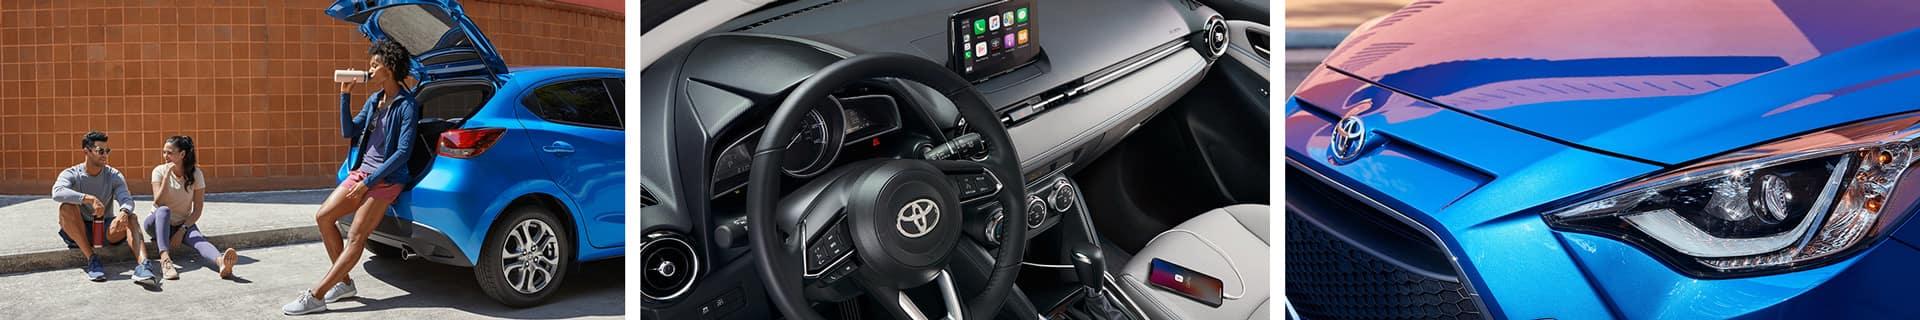 2020 Toyota Yaris Hatchback For Sale Dearborn MI | Detroit